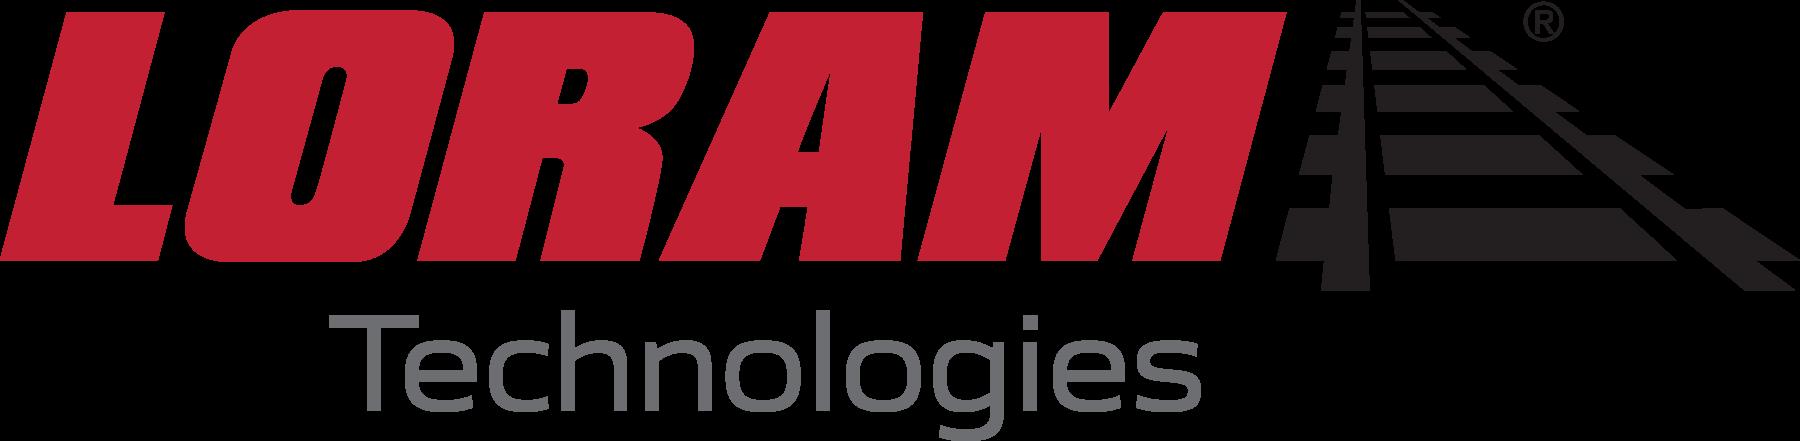 Loram Technologies, Inc. logo